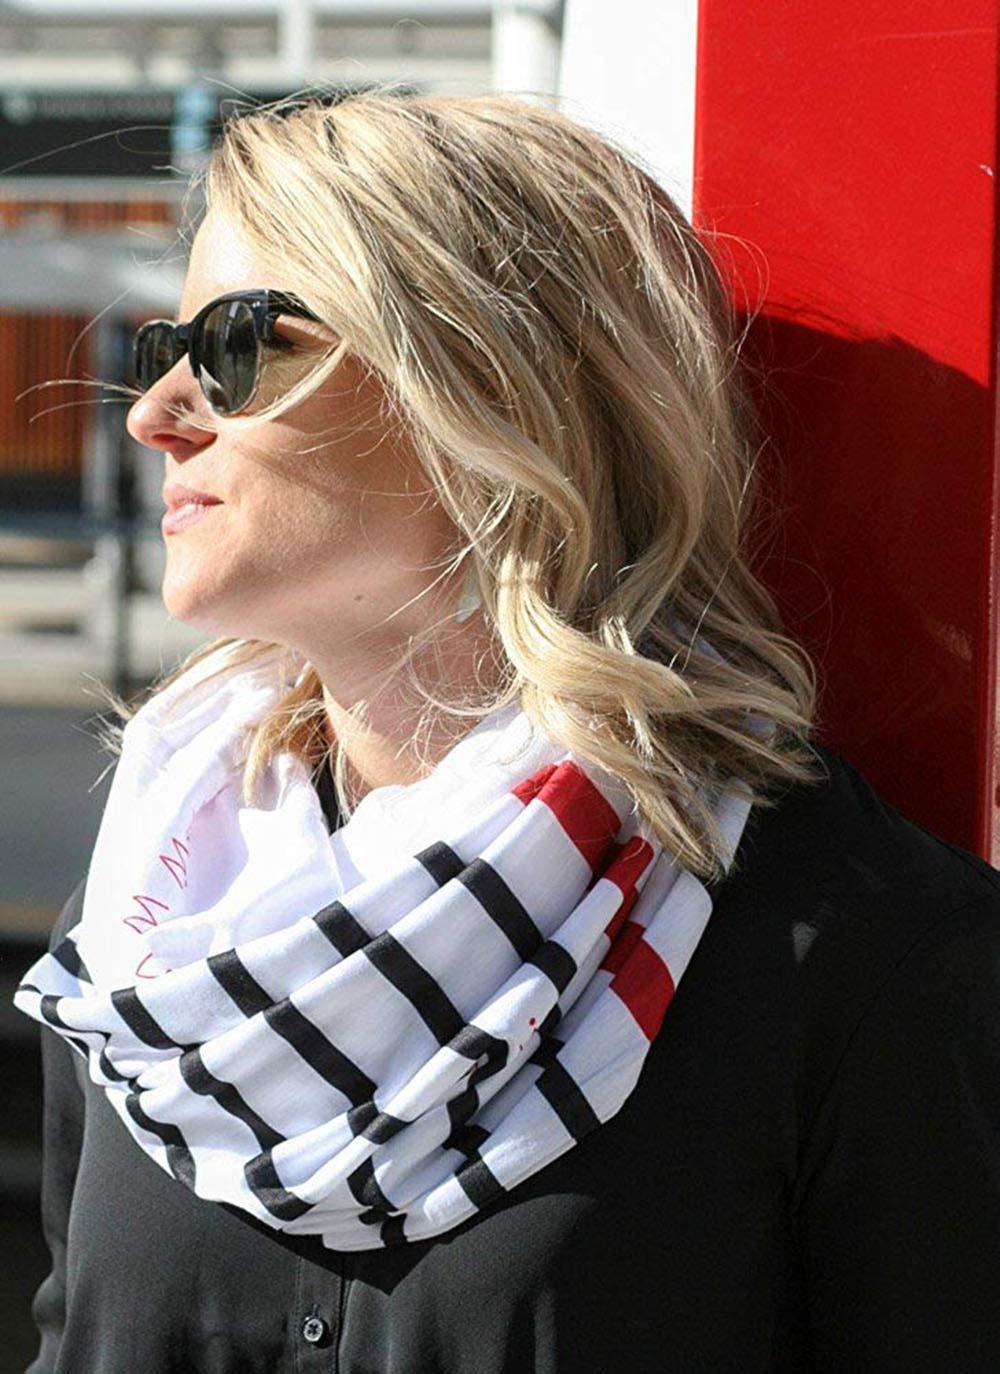 WensLTD Gift Clearance! Women Loop Scarf Infinity Wrap Hidden Zipper Pocket Warm Travel Couple Scarves (A) by WensLTD (Image #3)